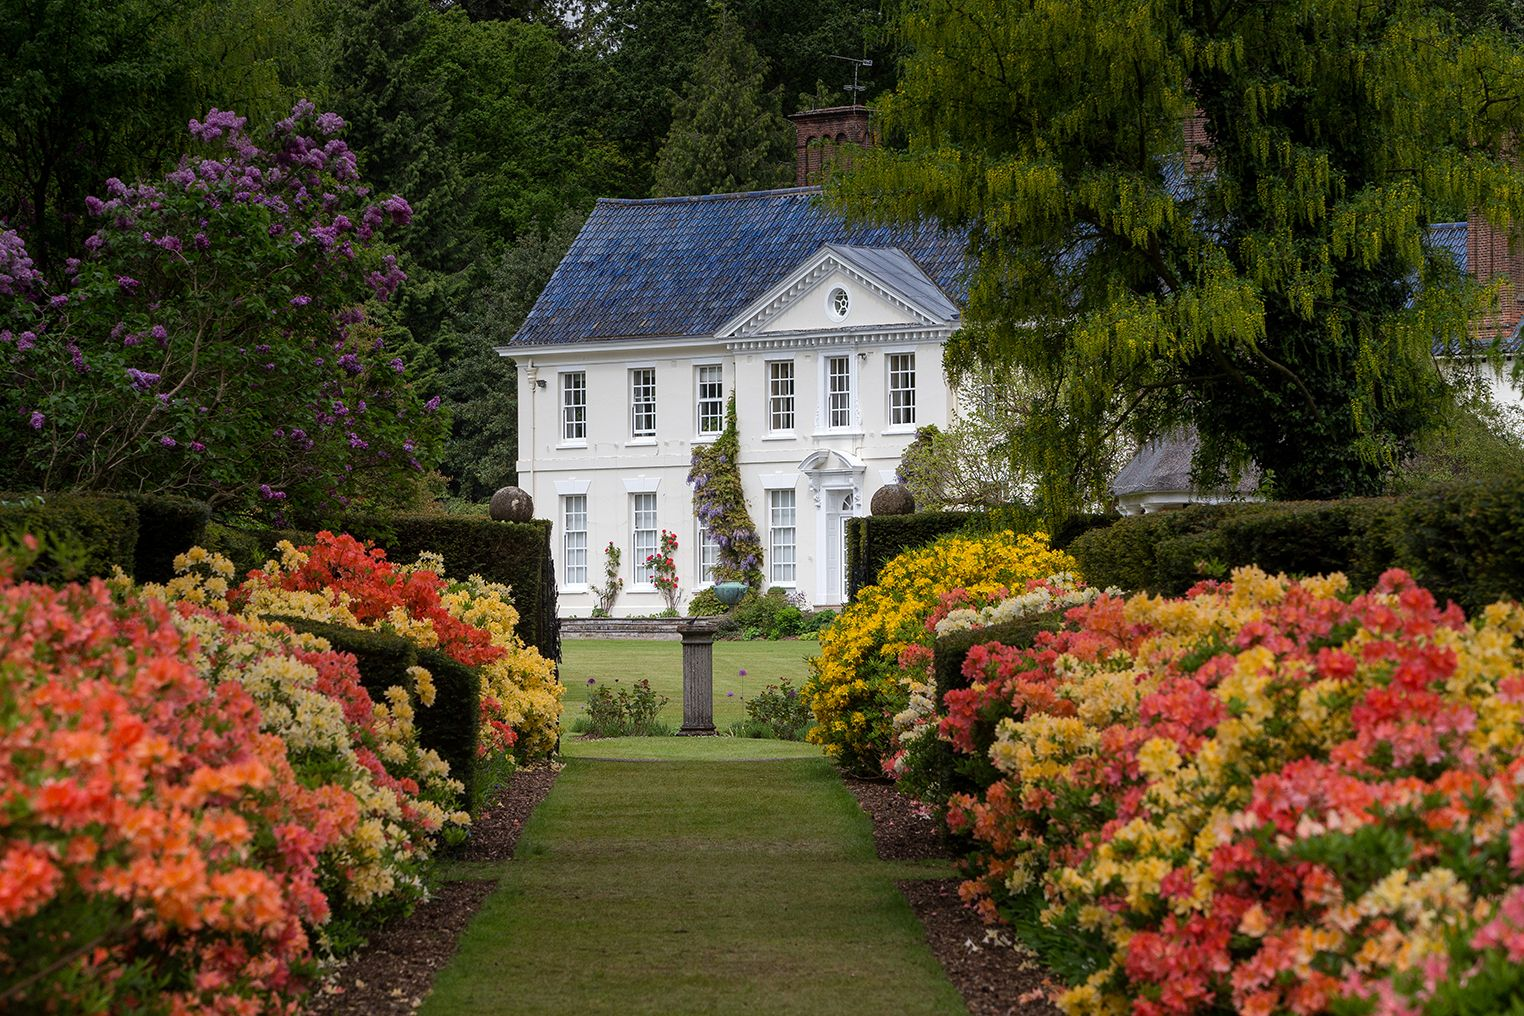 Stody Lodge Garden, Norfolk, England